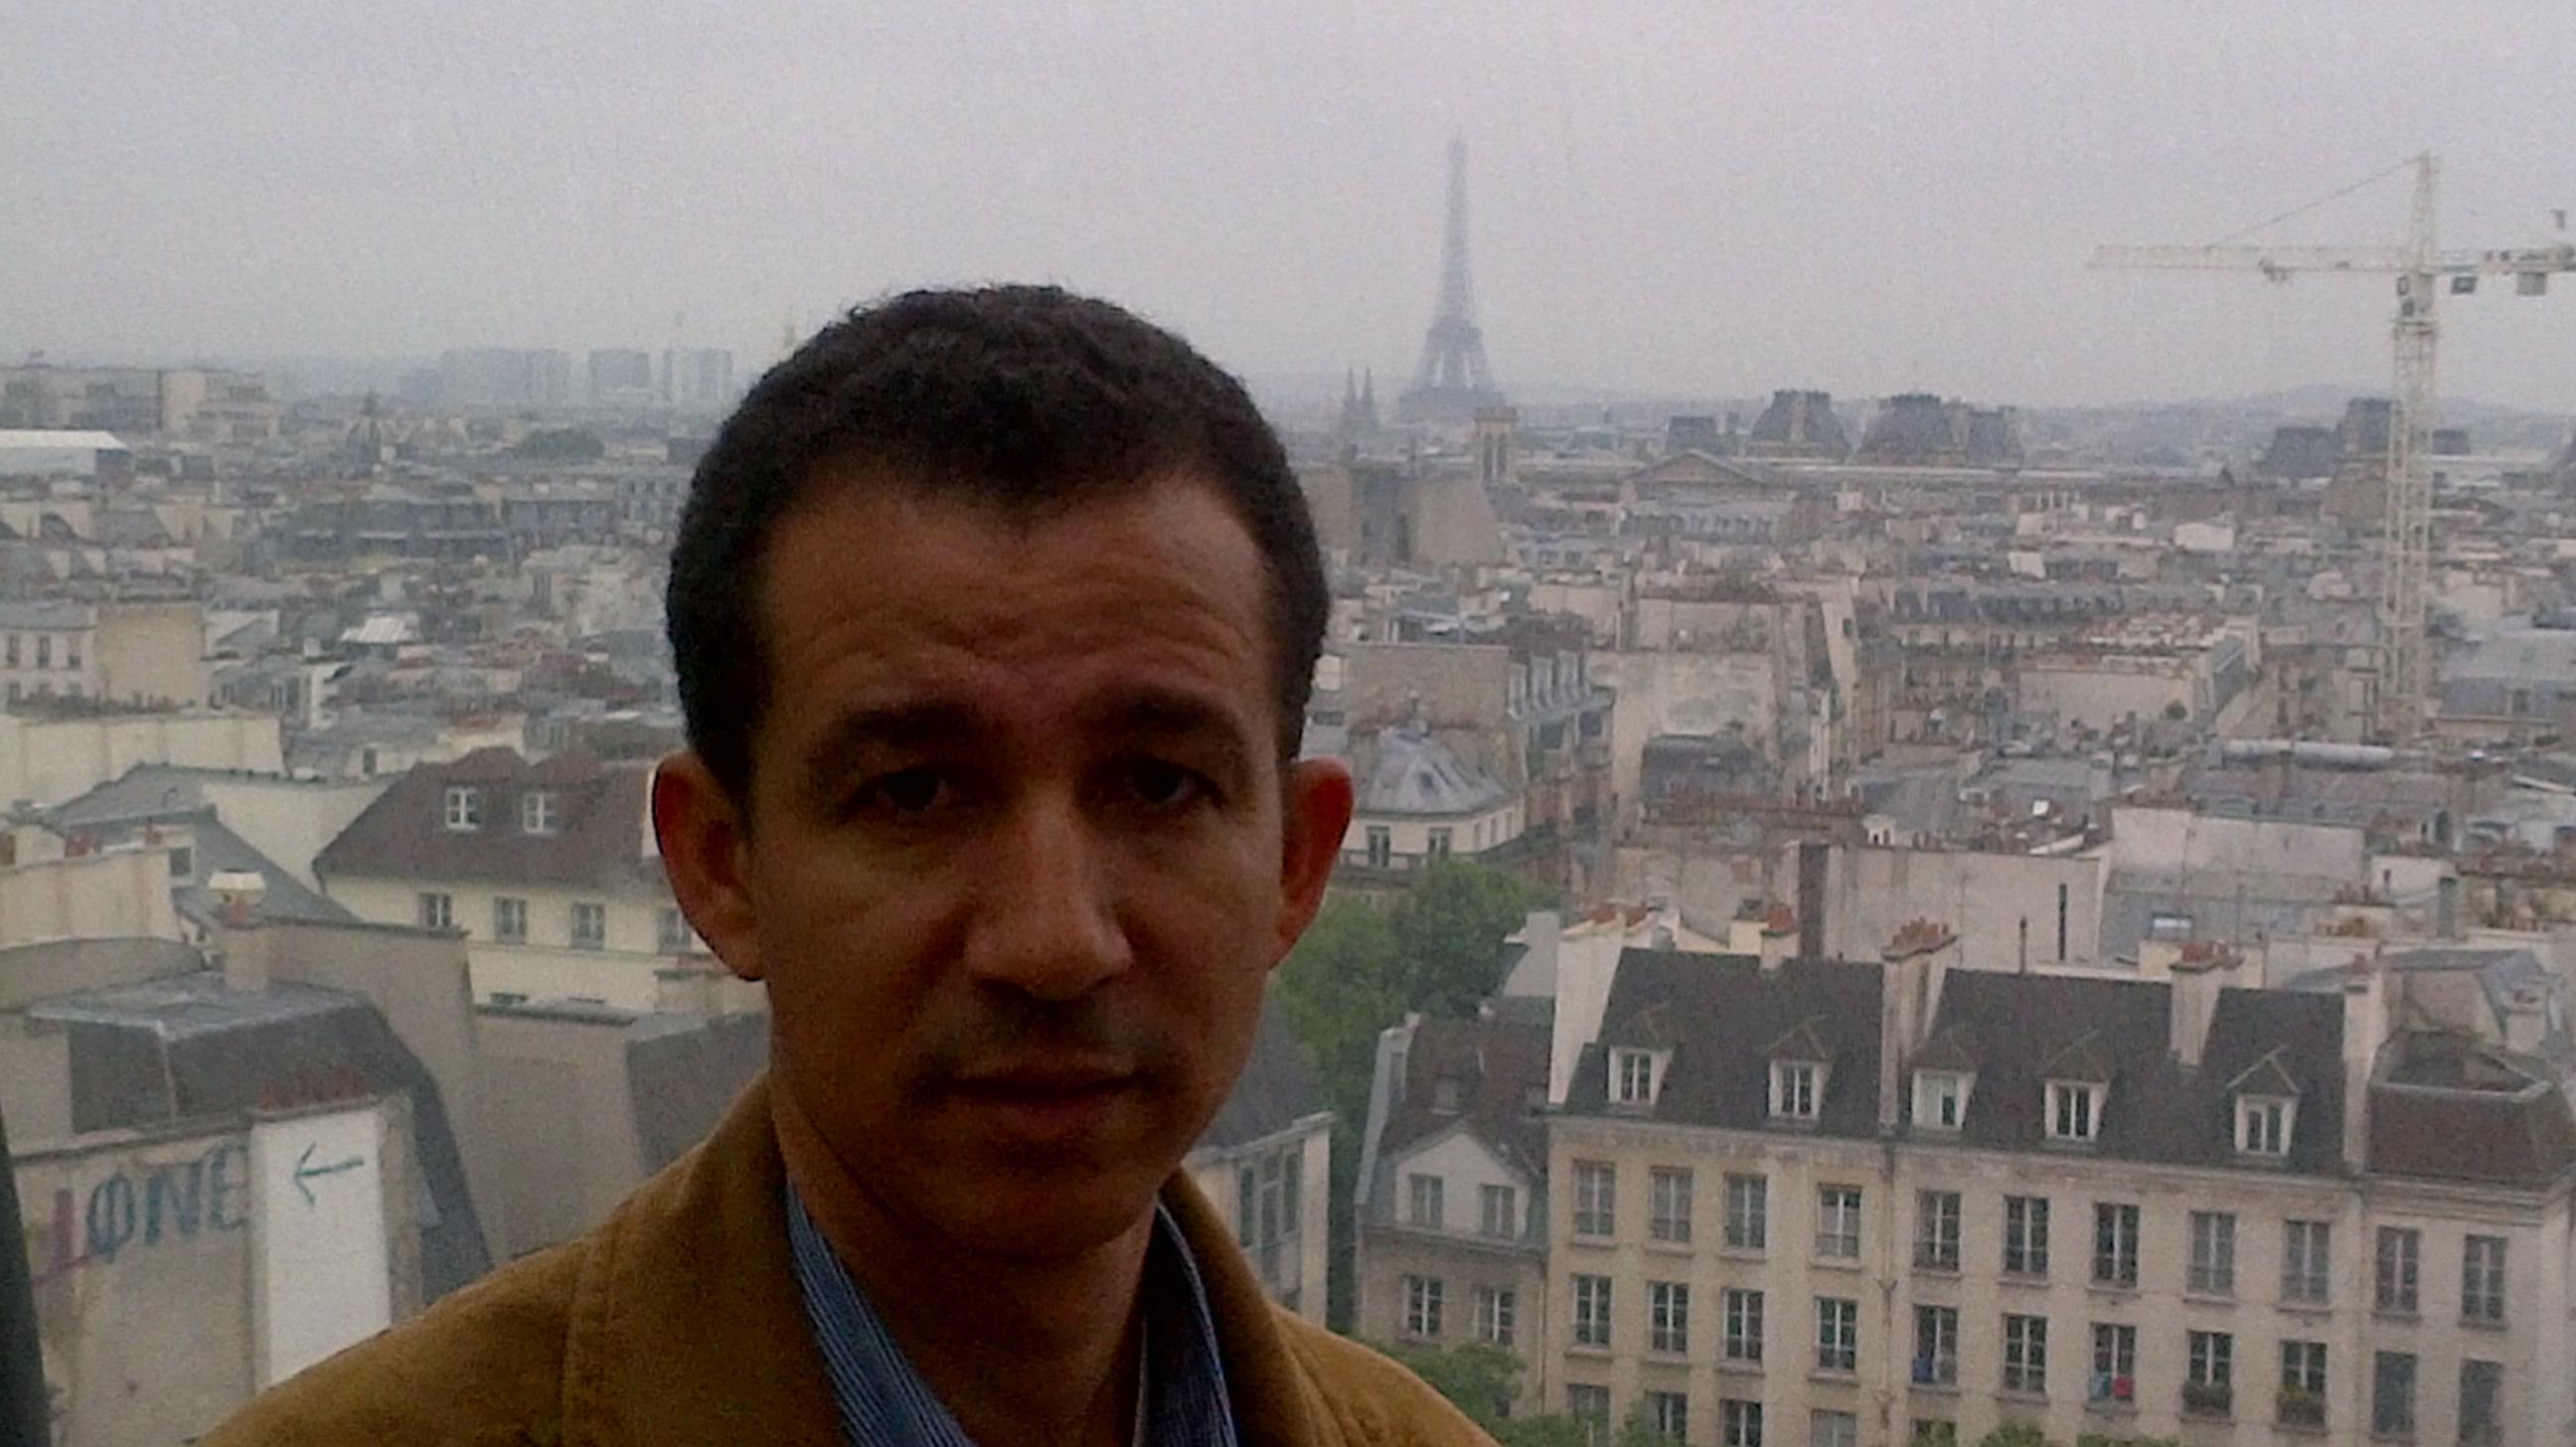 Vista panorámica de París, Francia